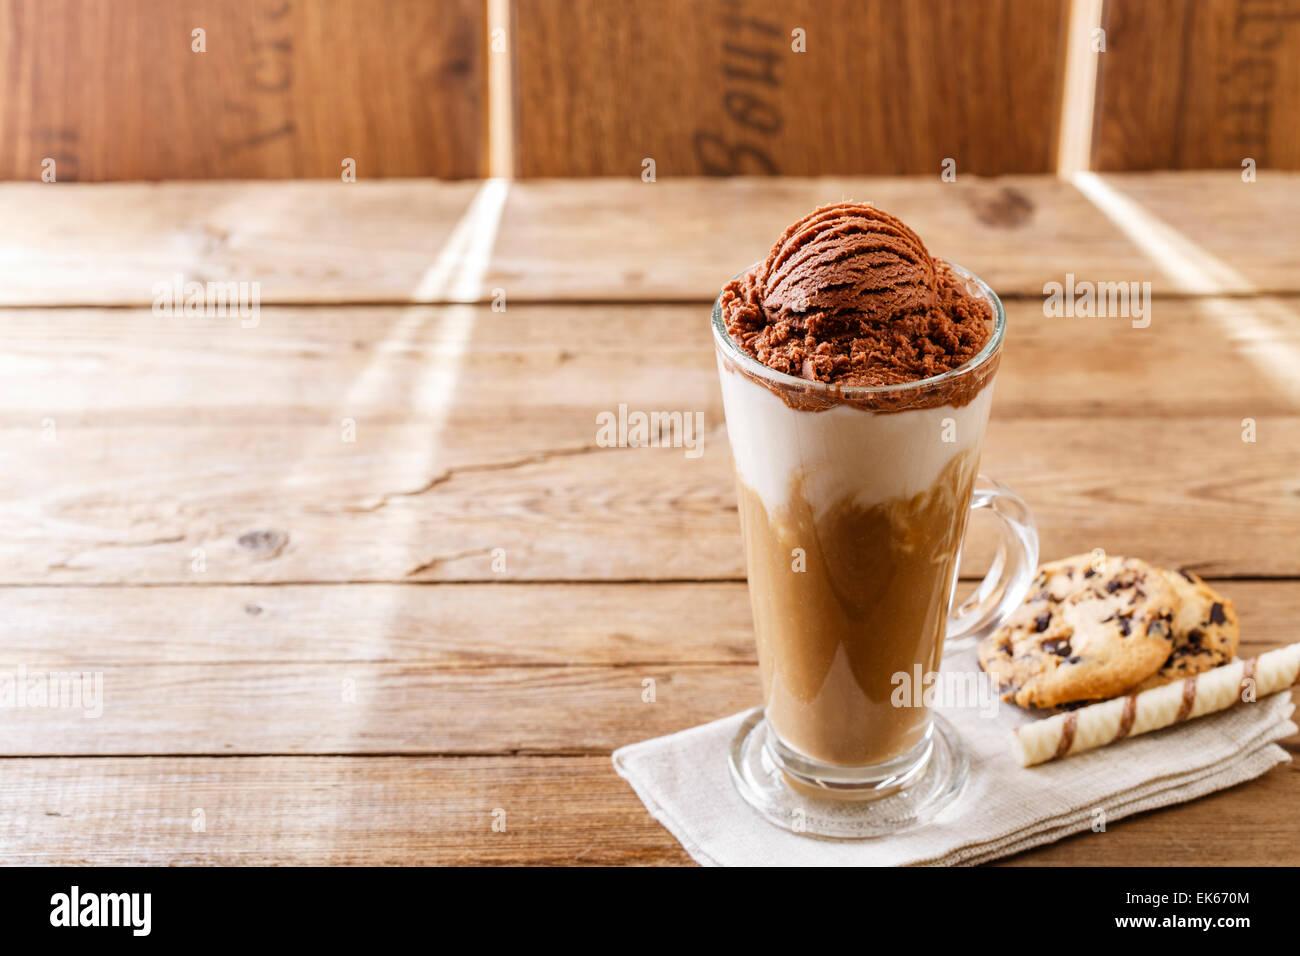 iced coffee with milk and chocolate ice cream - Stock Image